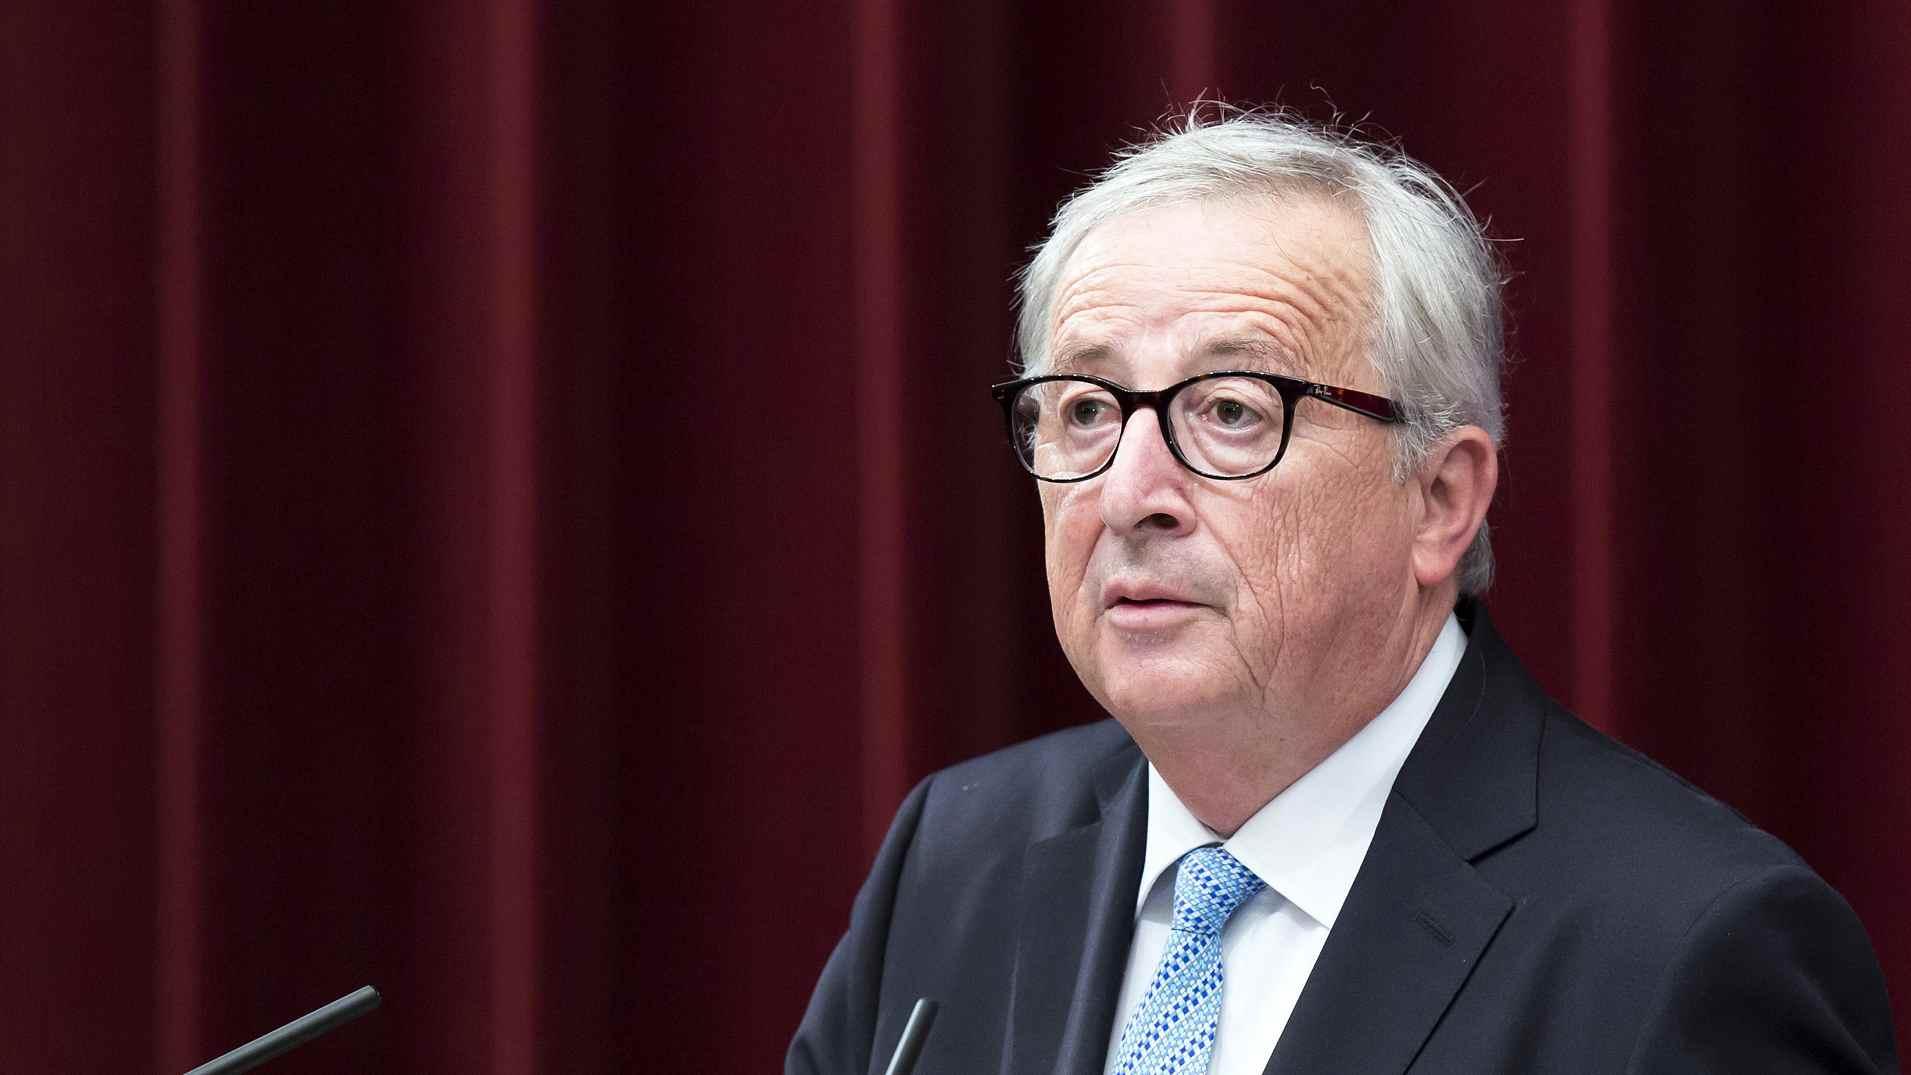 Jean-Claude Juncker to meet Donald Trump for trade talks on July 25